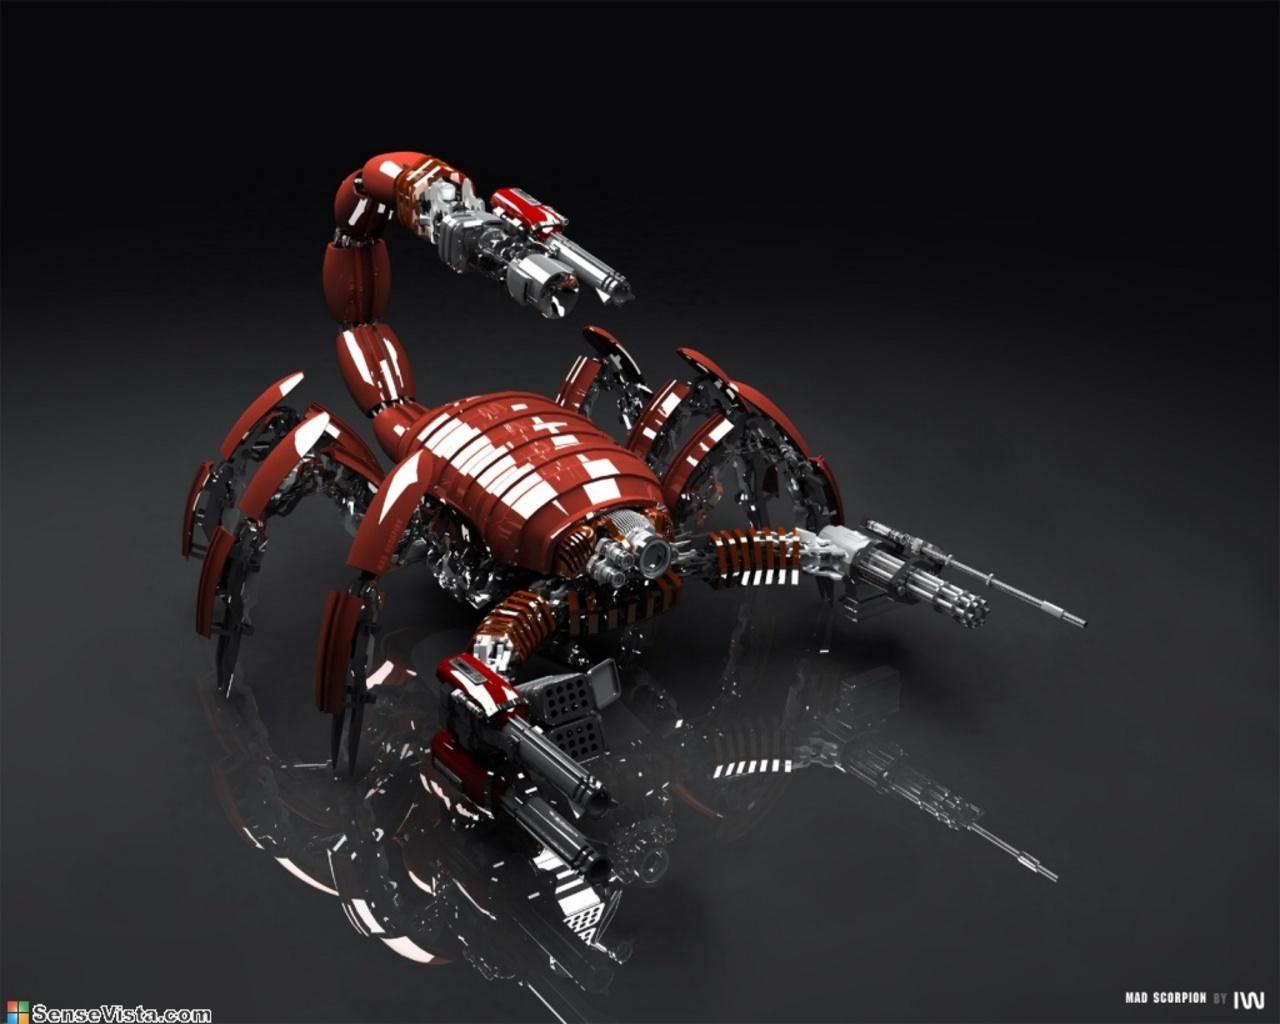 http://4.bp.blogspot.com/-rbrpMZviy08/T5R65Z00QHI/AAAAAAAABzo/TGIkMZuBfgs/s1600/Escorpion%2B2.jpg